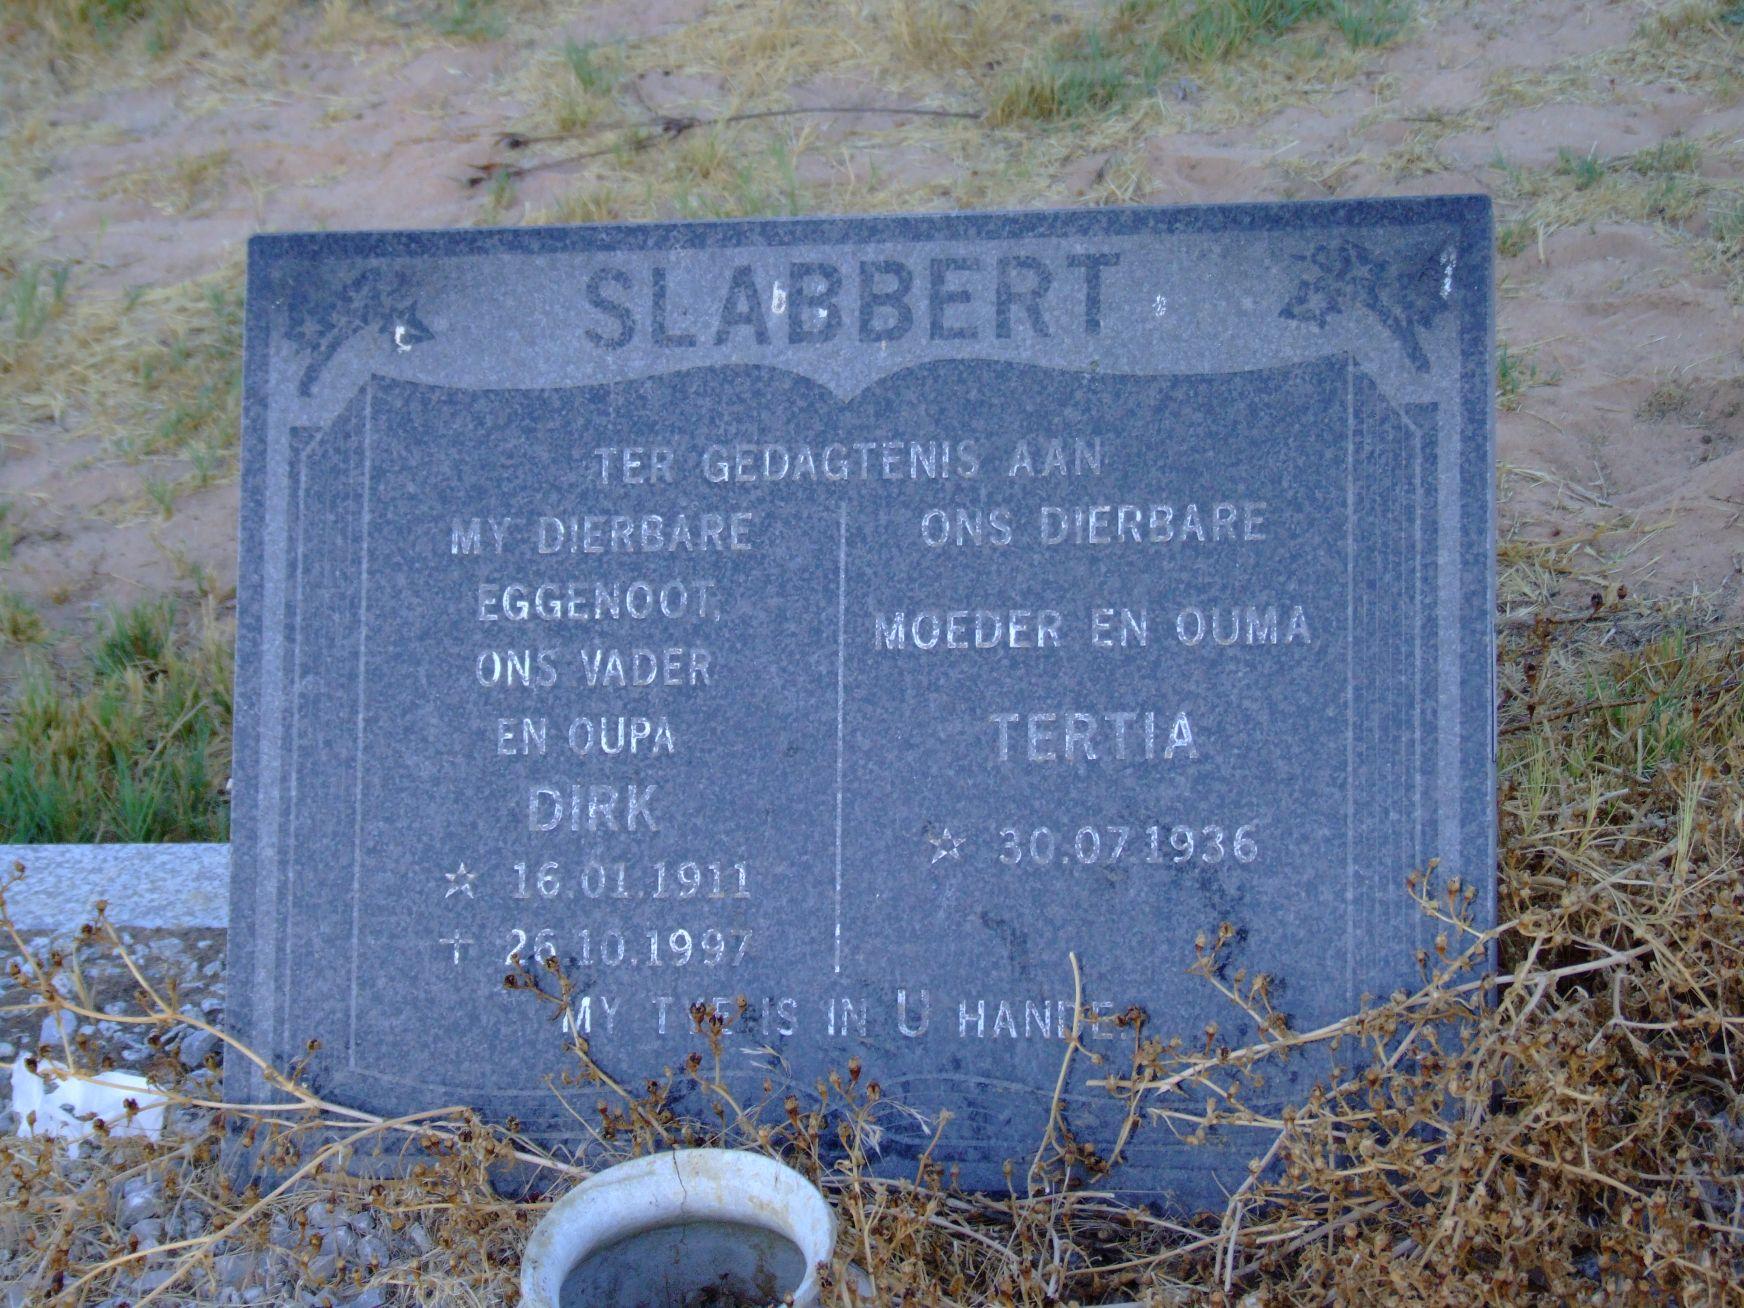 Slabbert, Dirk + Slabbert Tertia